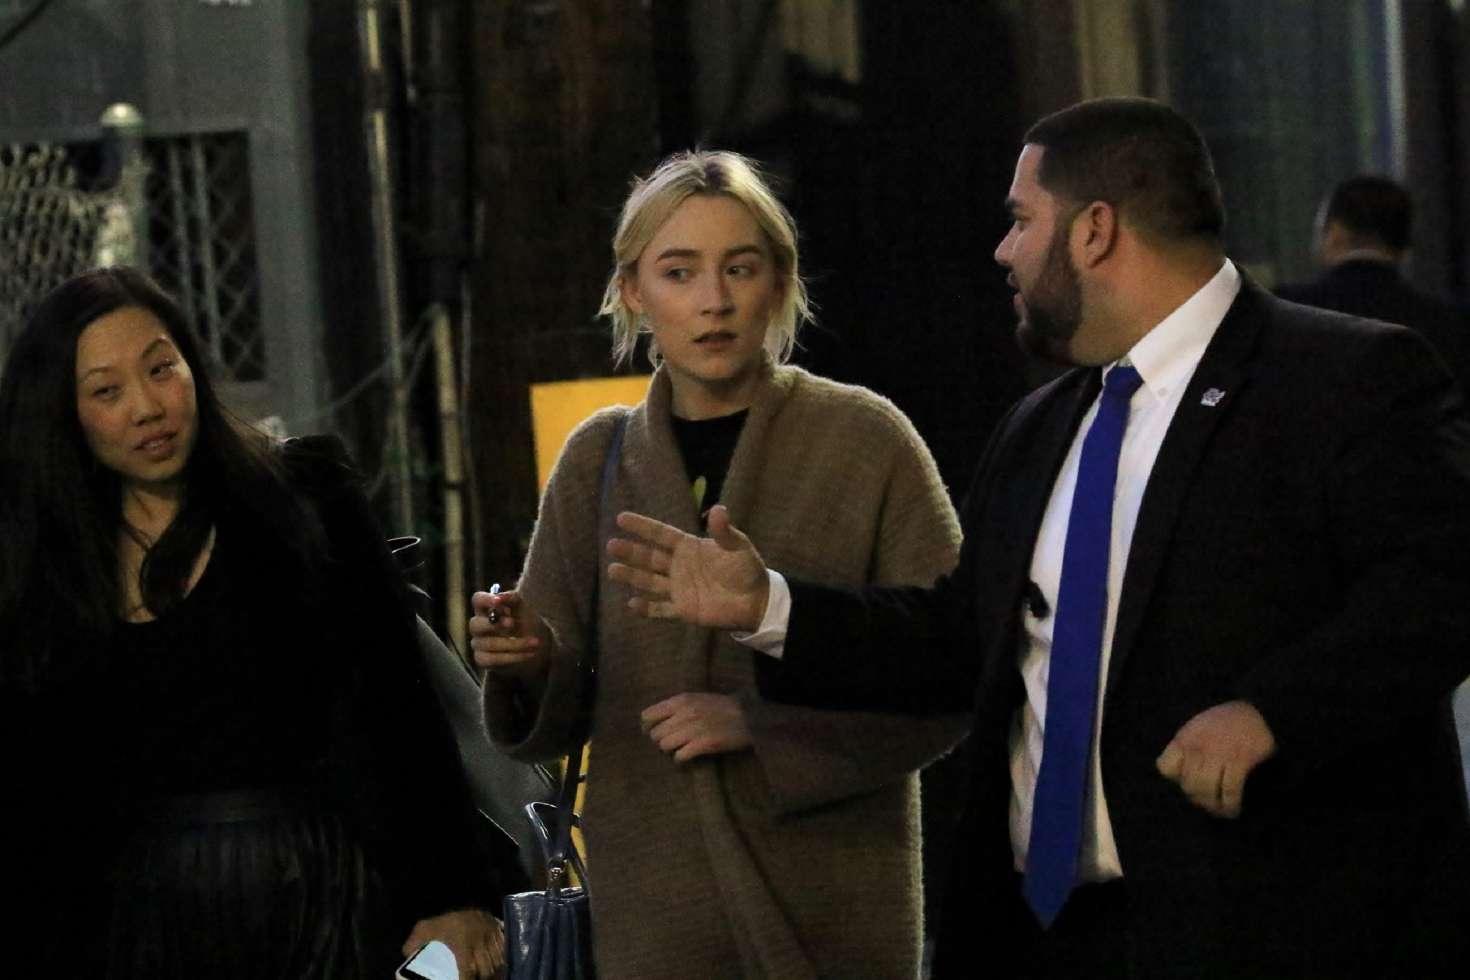 Saoirse Ronan 2018 : Saoirse Ronan: Arriving at Jimmy Kimmel Live -14